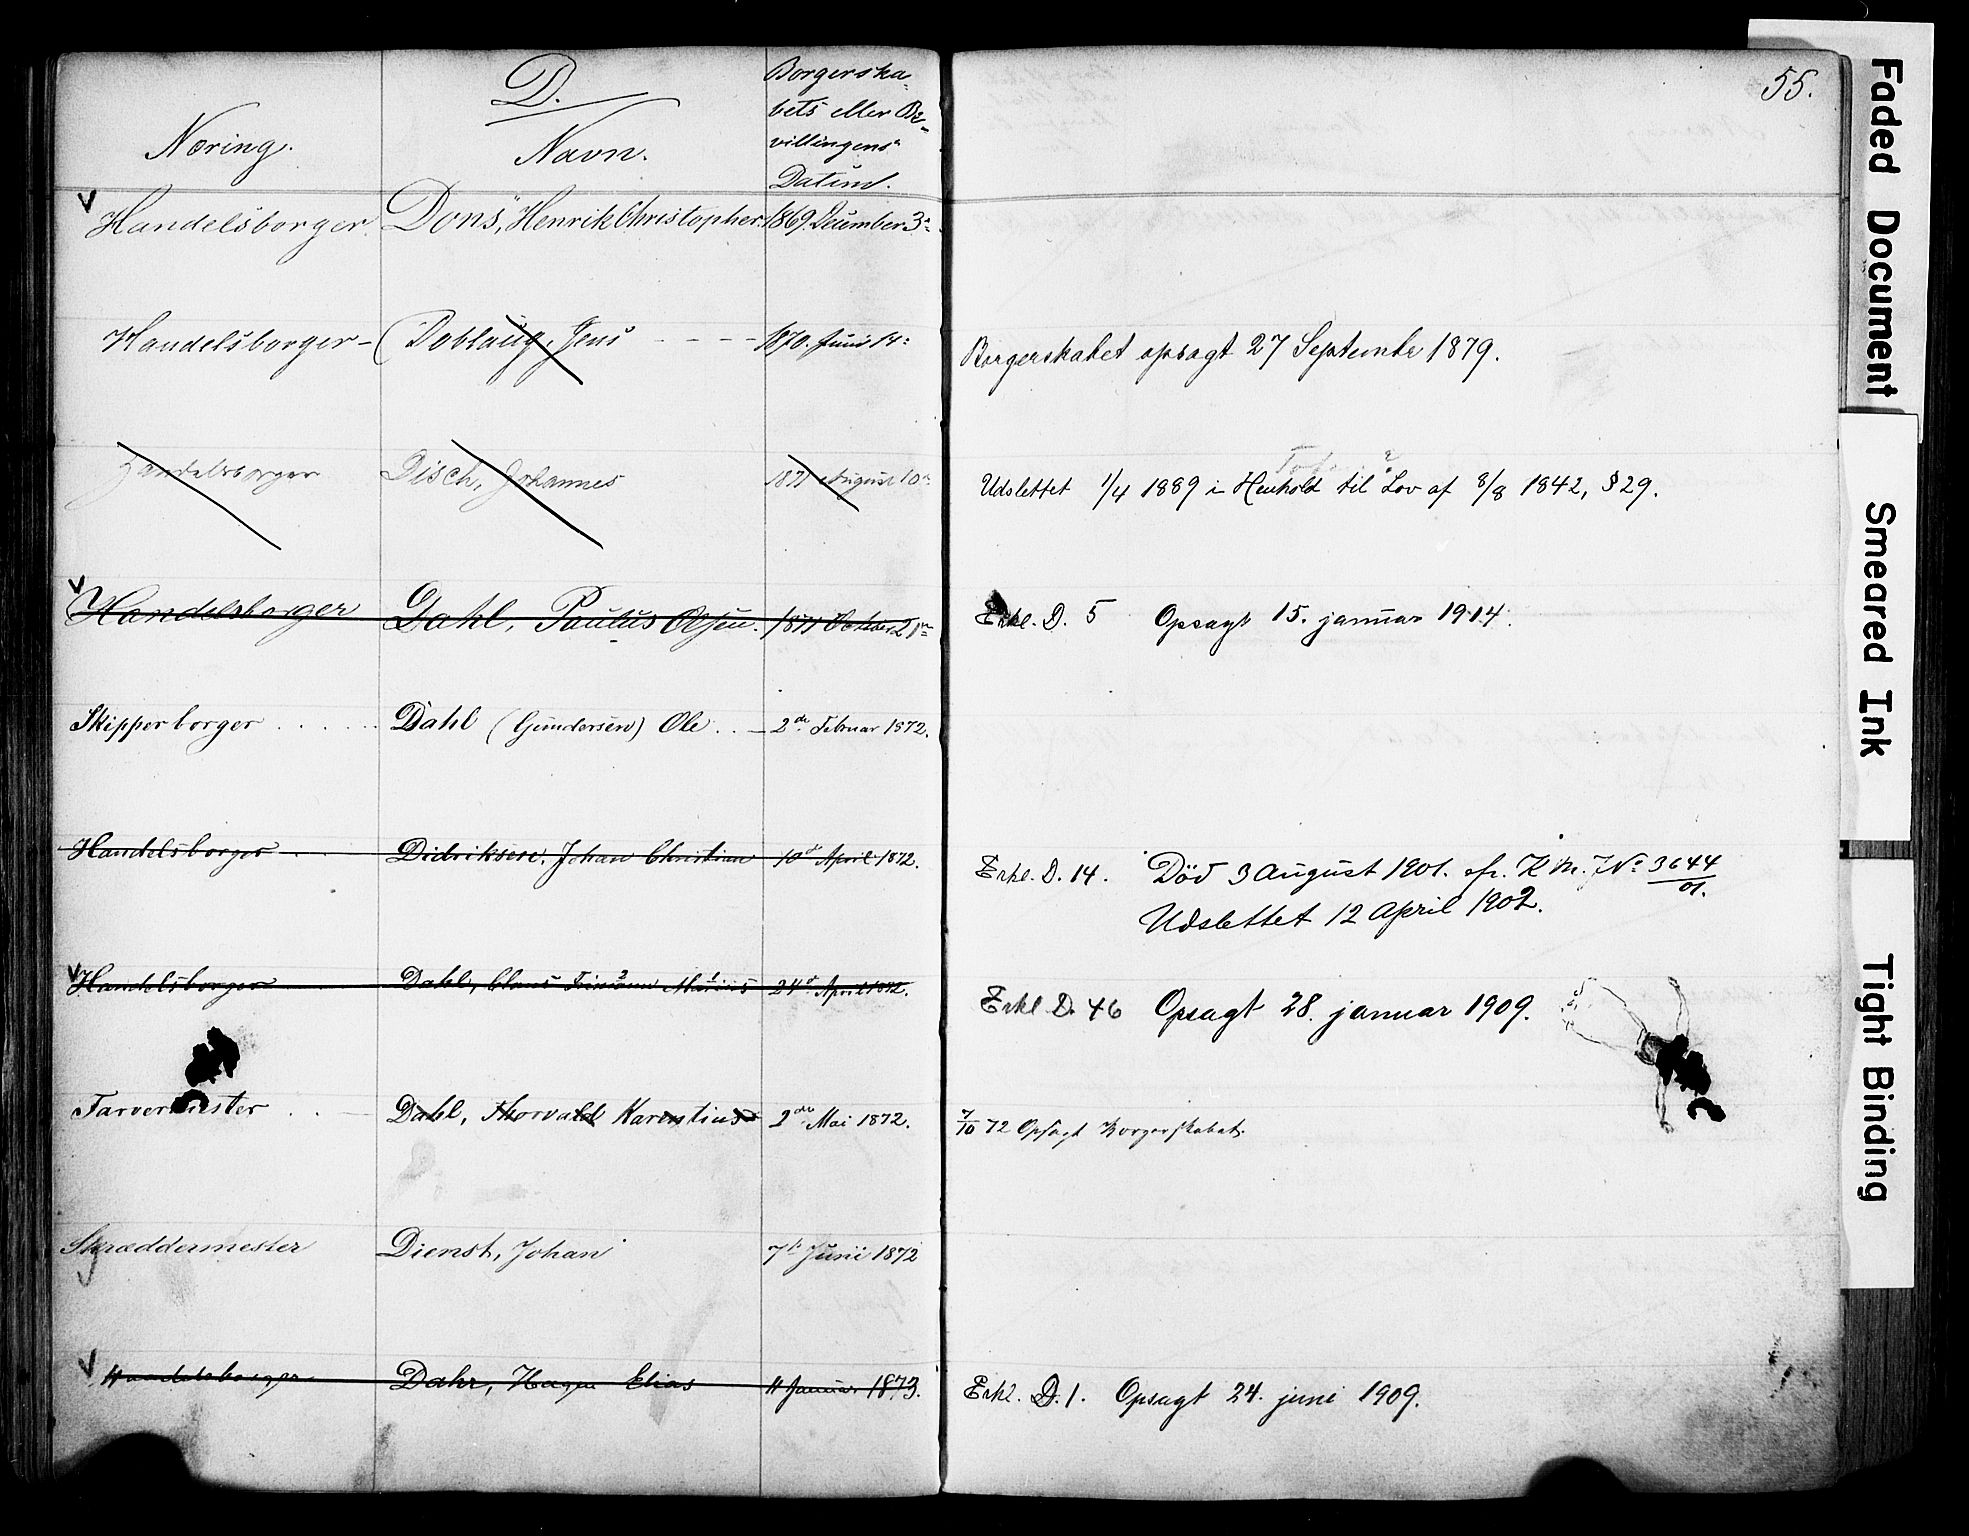 SAO, Kristiania magistrat, F/Fb/L0004: Borgerrulle, 1860-1879, s. 57